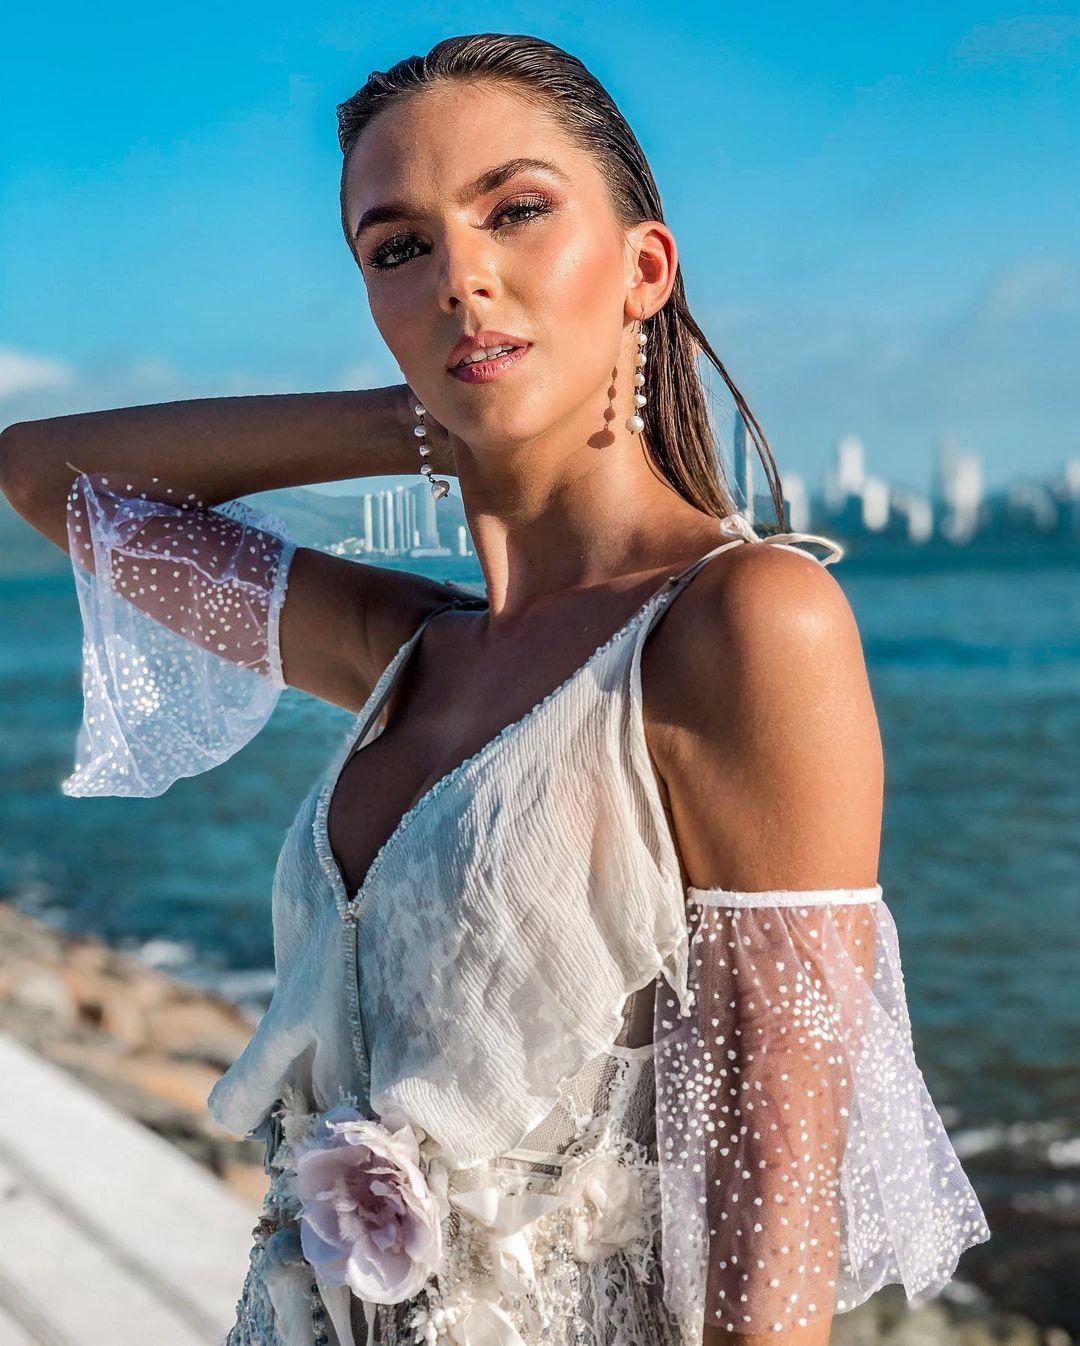 ana flavia giacomini, miss ilha dos lobos mundo 2019. - Página 2 Fvozqv10